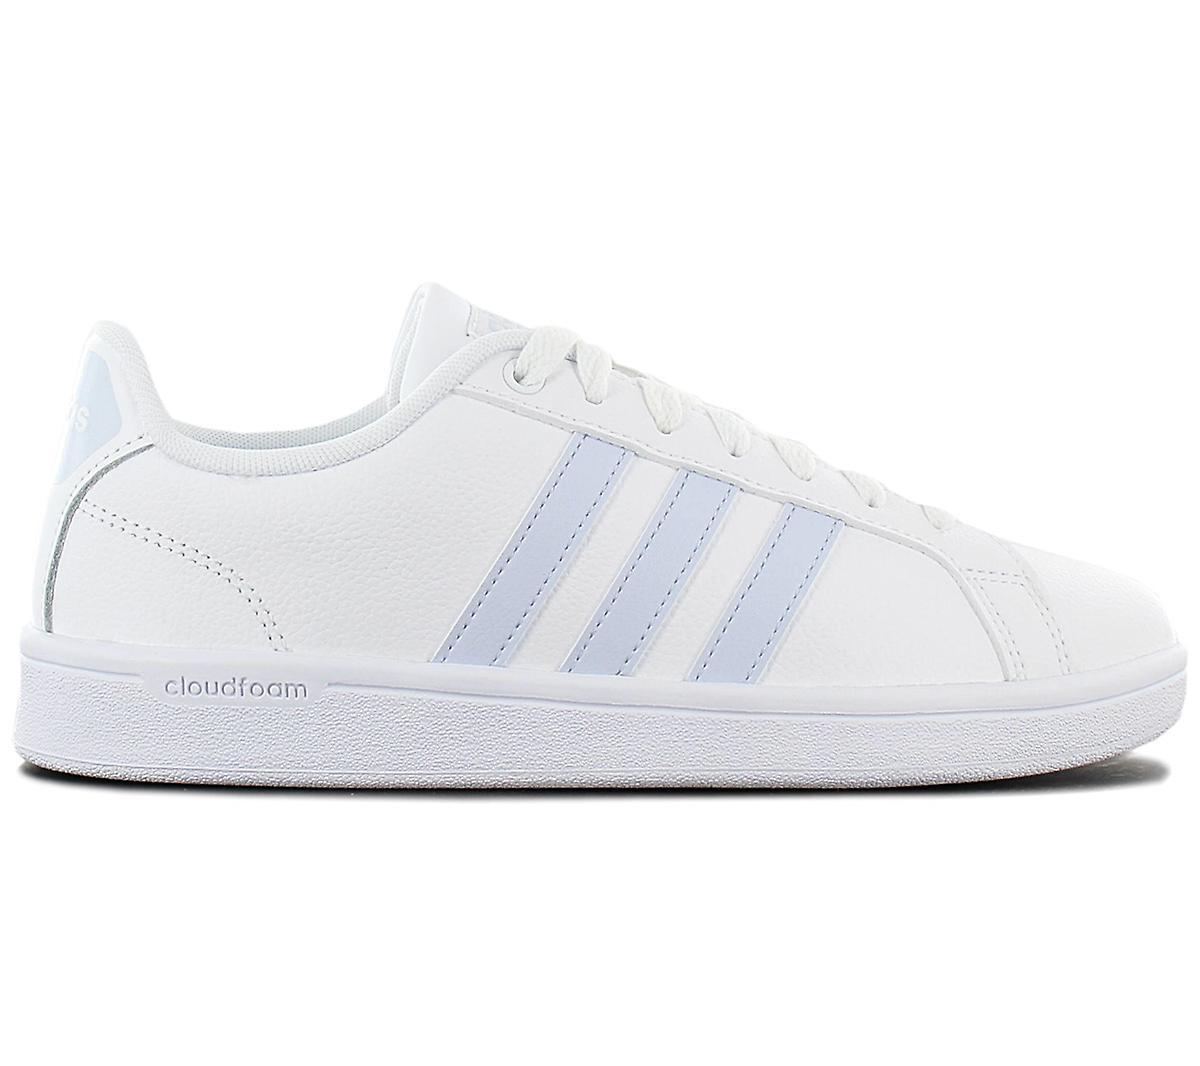 adidas CF Advantage B28095 Damen Schuhe Weiß Sneakers Sportschuhe gx3jE